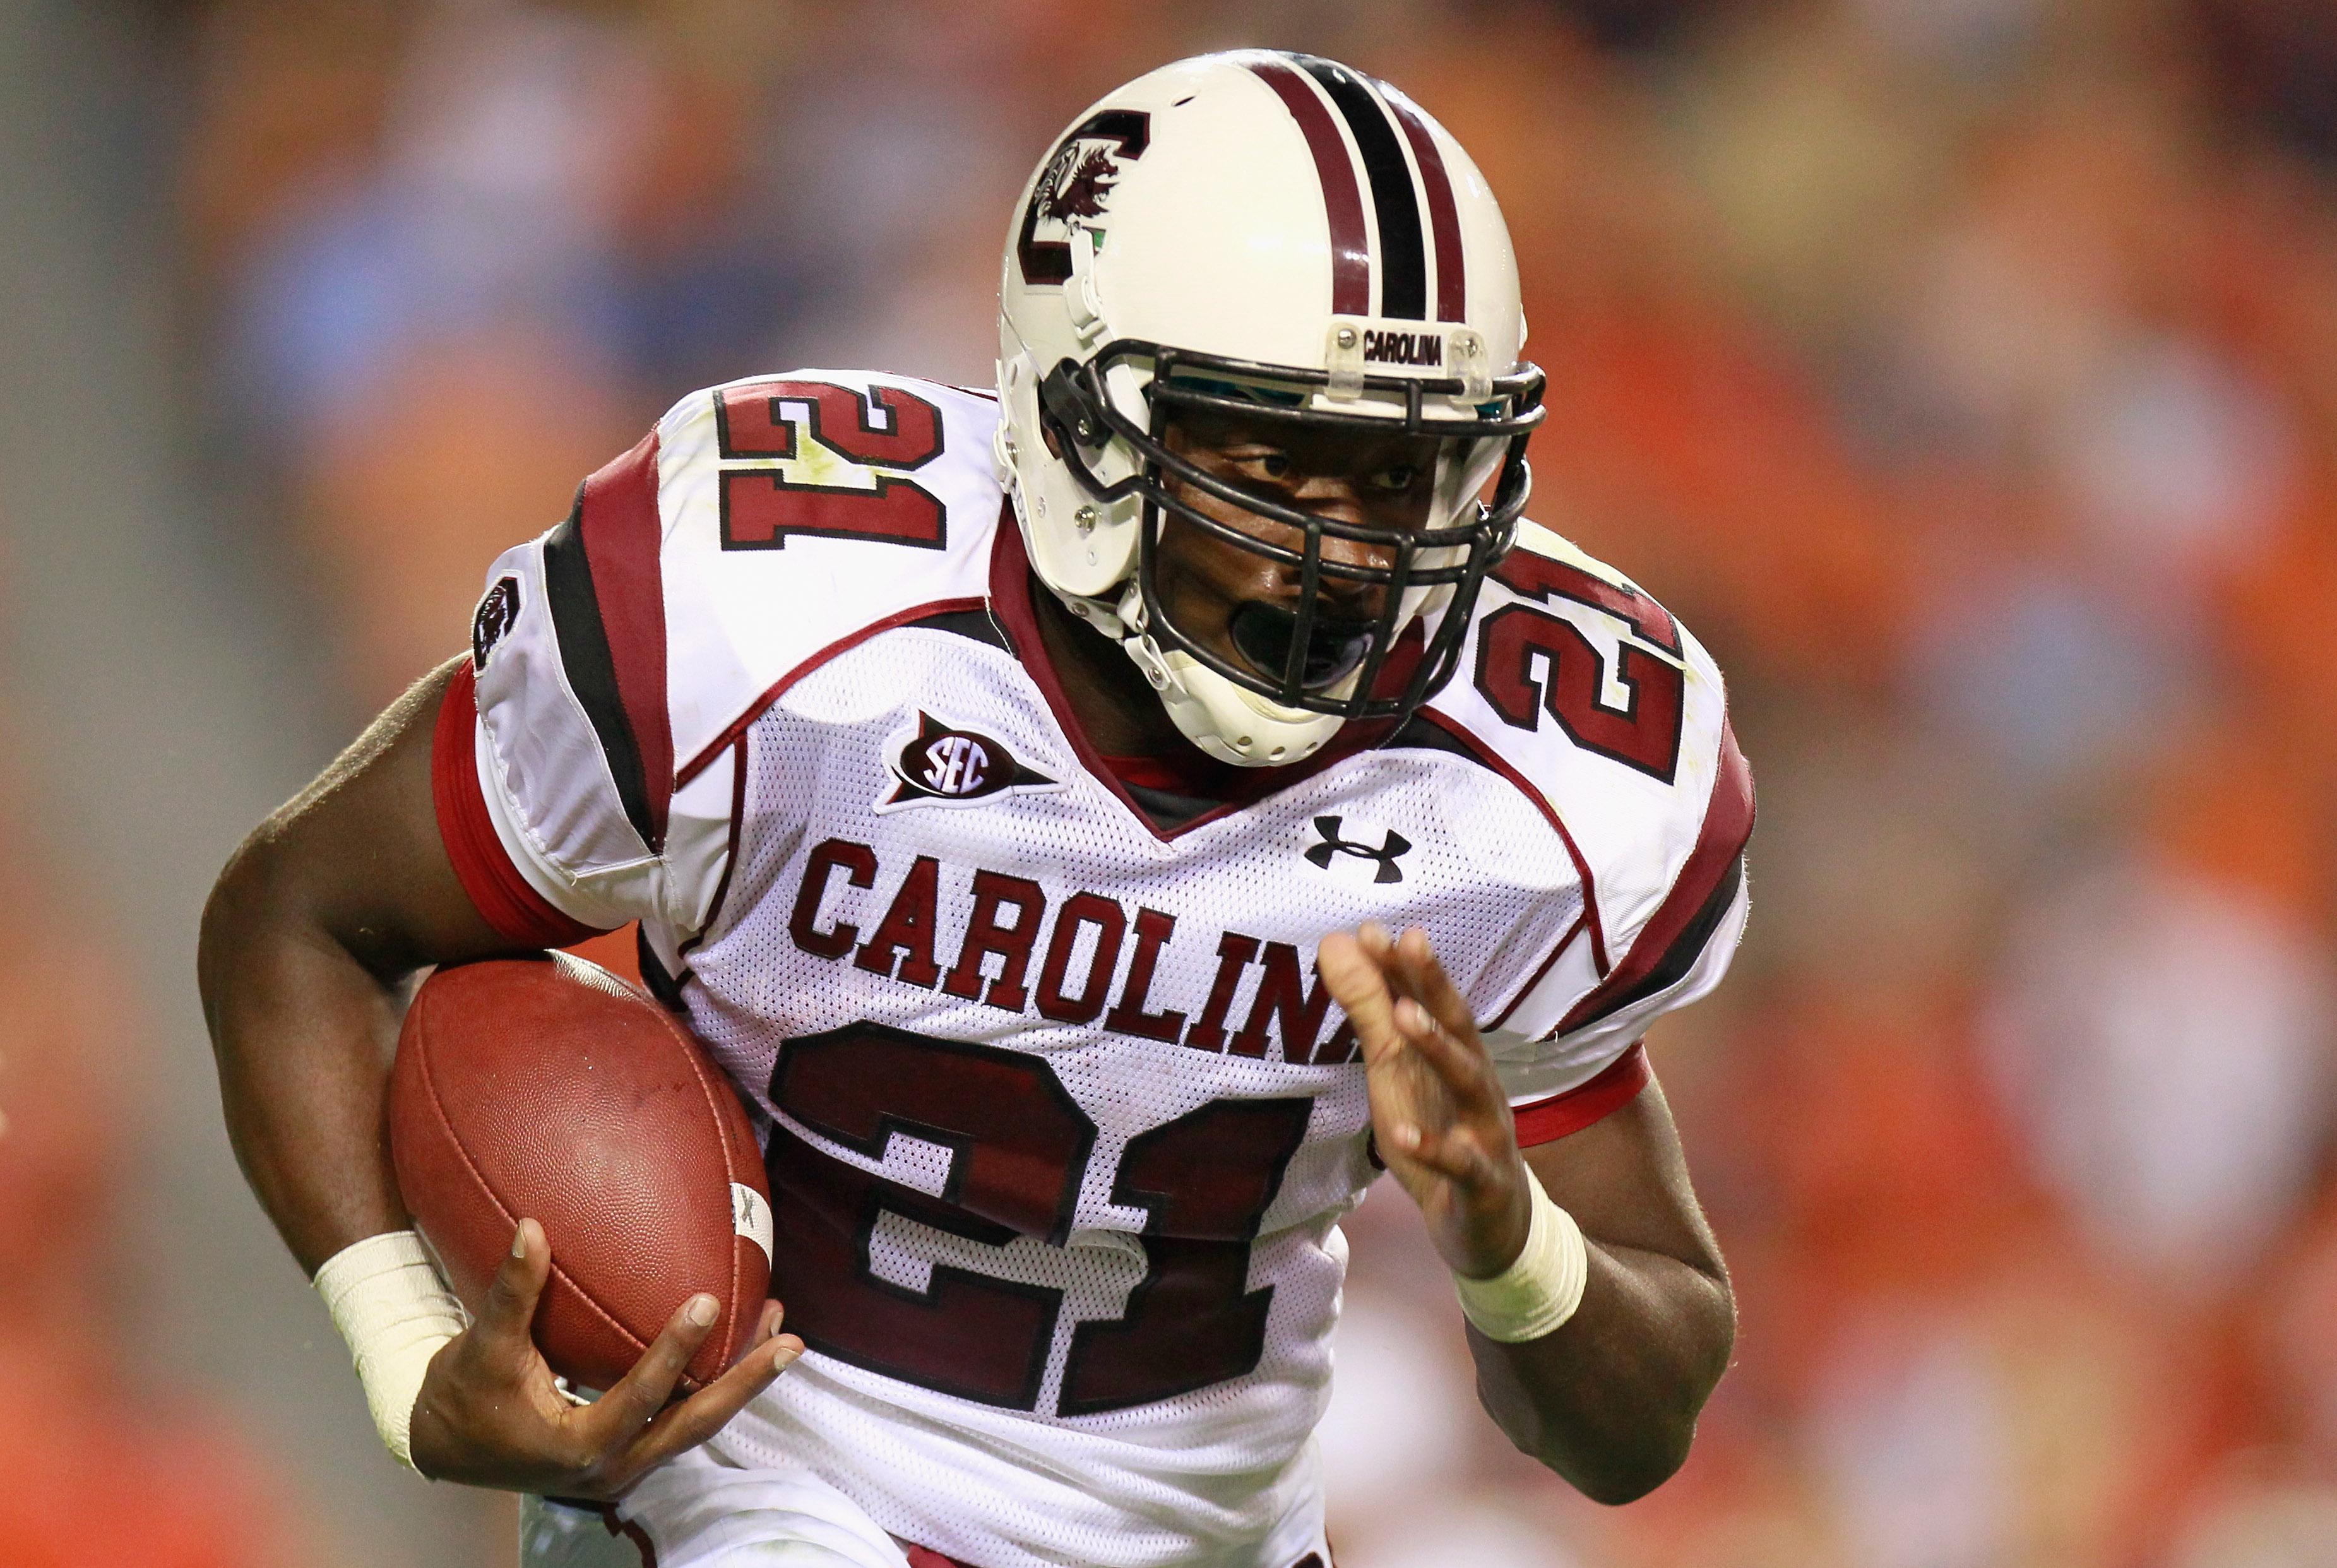 South Carolina RB Marcus Lattimore